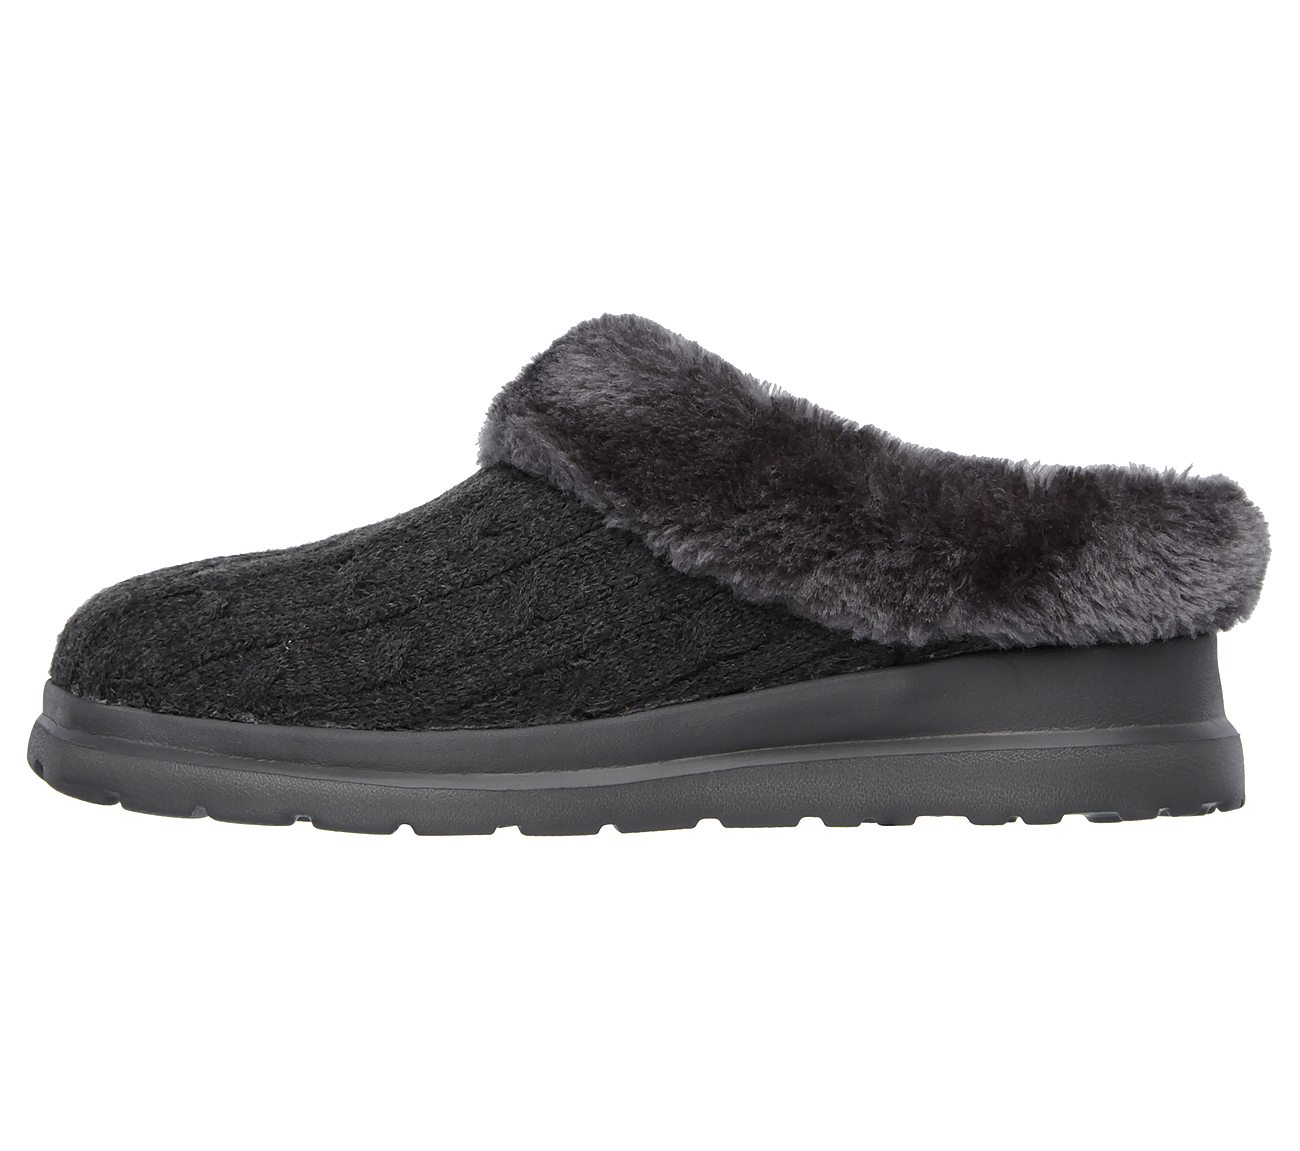 skechers bobs cherish wonder fall slippers